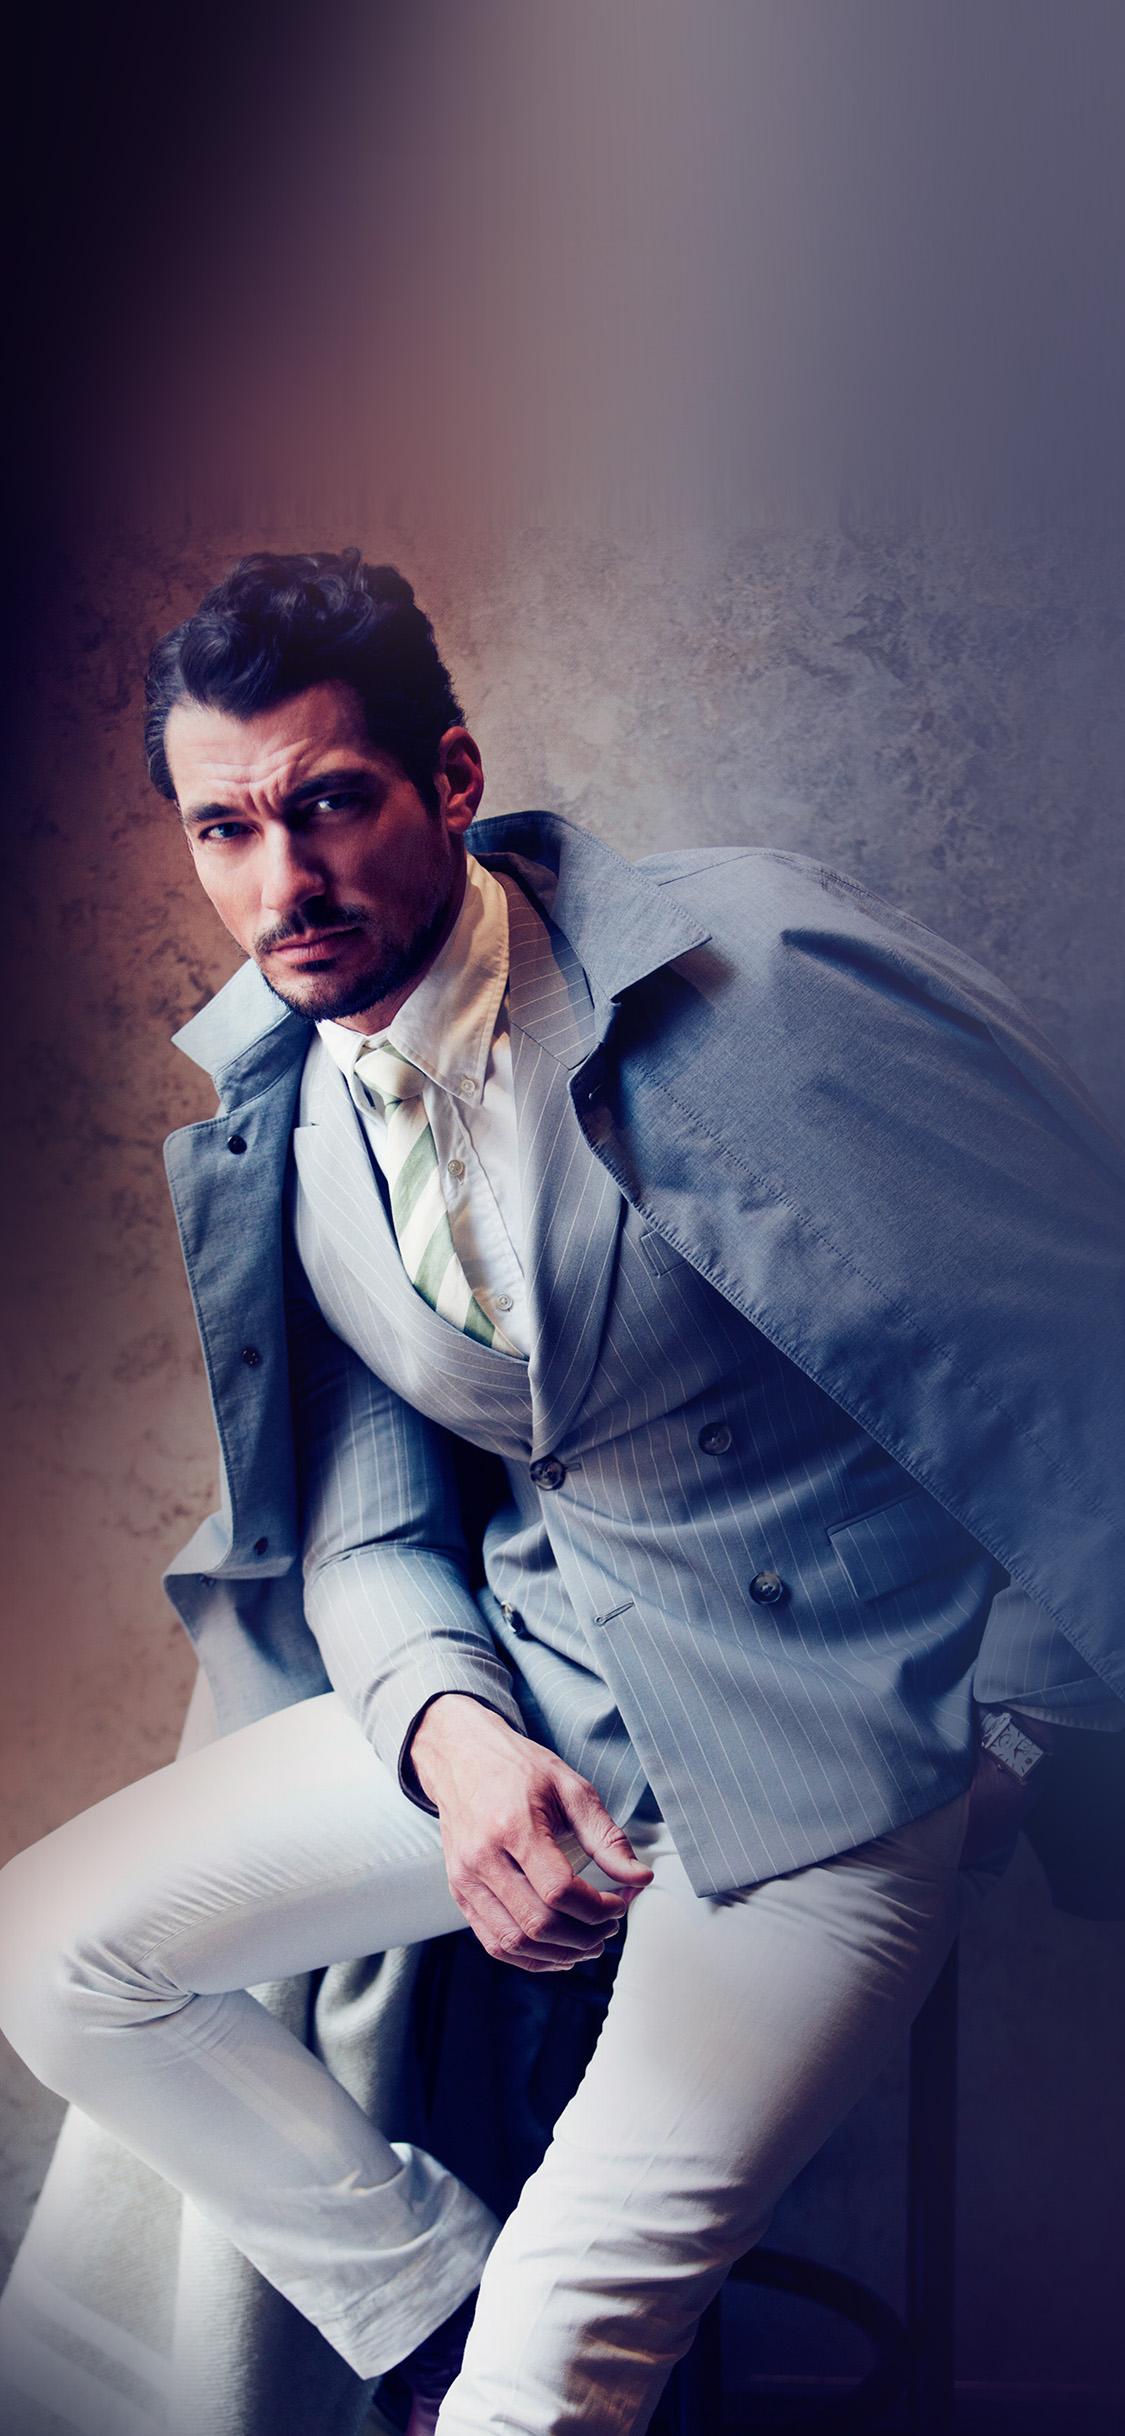 iPhonexpapers.com-Apple-iPhone-wallpaper-hp13-man-boy-model-handsome